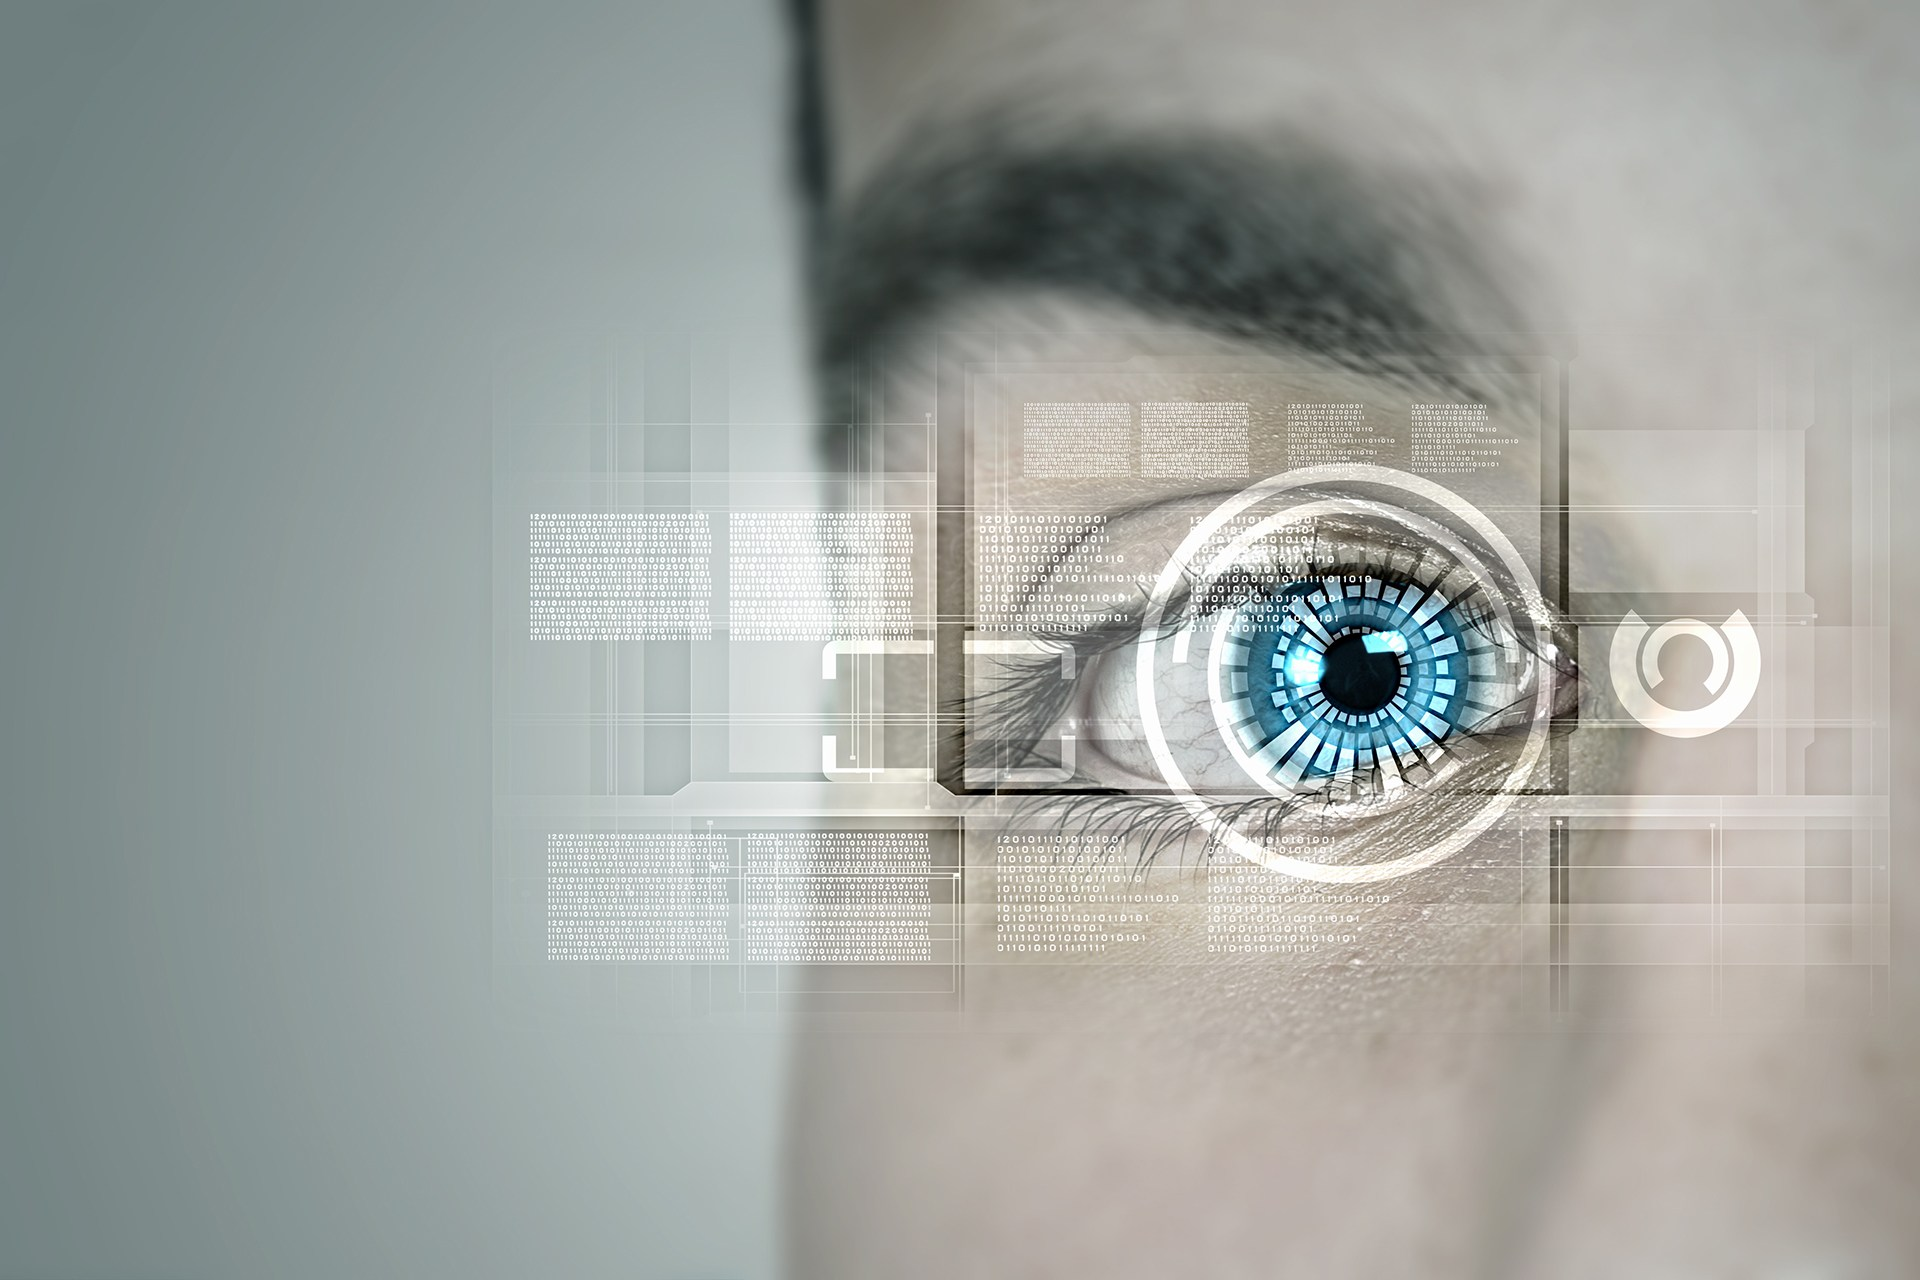 Smart of schlimm? | Pushing the limits of communication technology | MCS